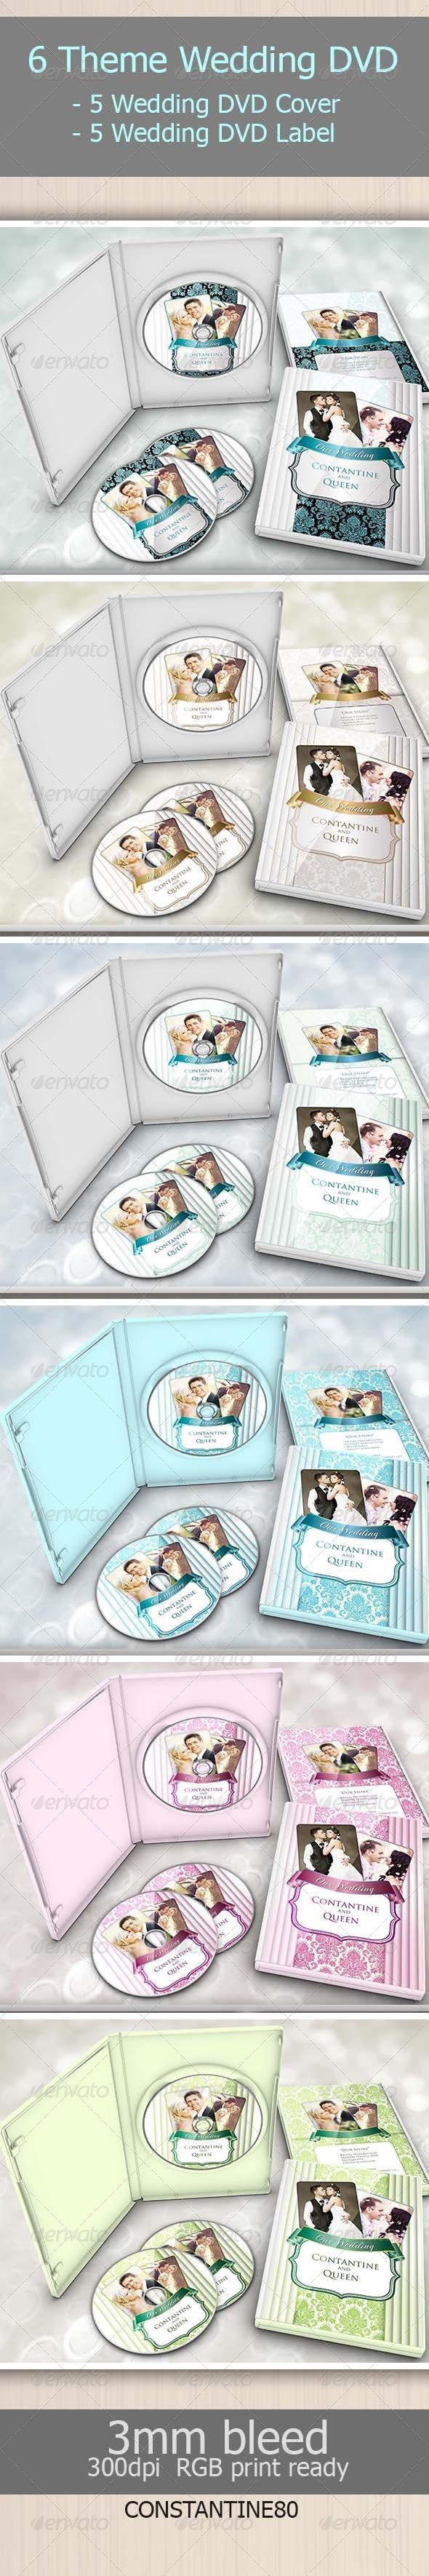 6 Theme Wedding Dvd - Weddings Cards & Invites